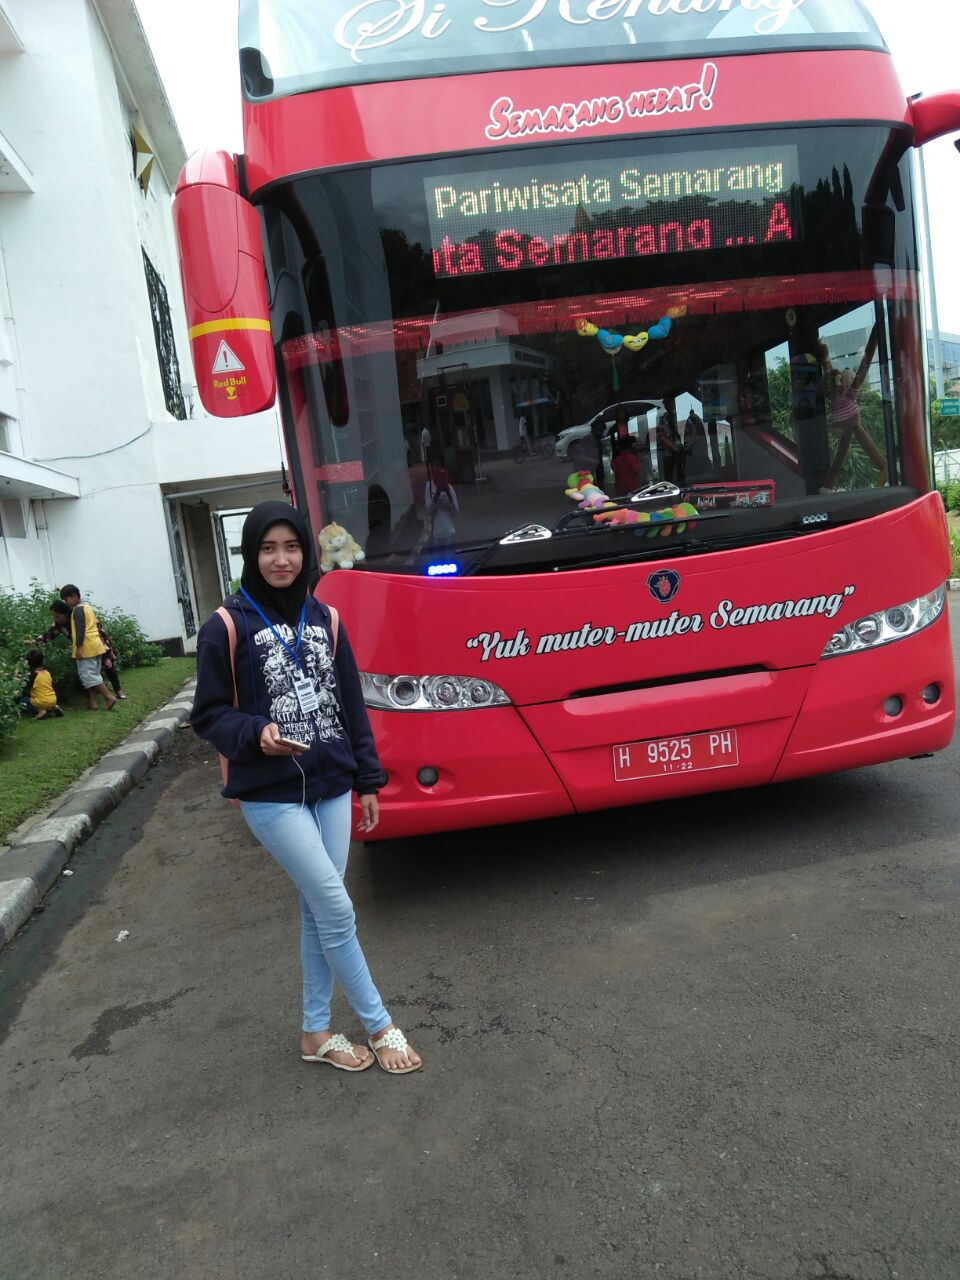 Bus Tingkat Semarang Wisata Memulai Tur Naik Tinggal Menyambangi Museum